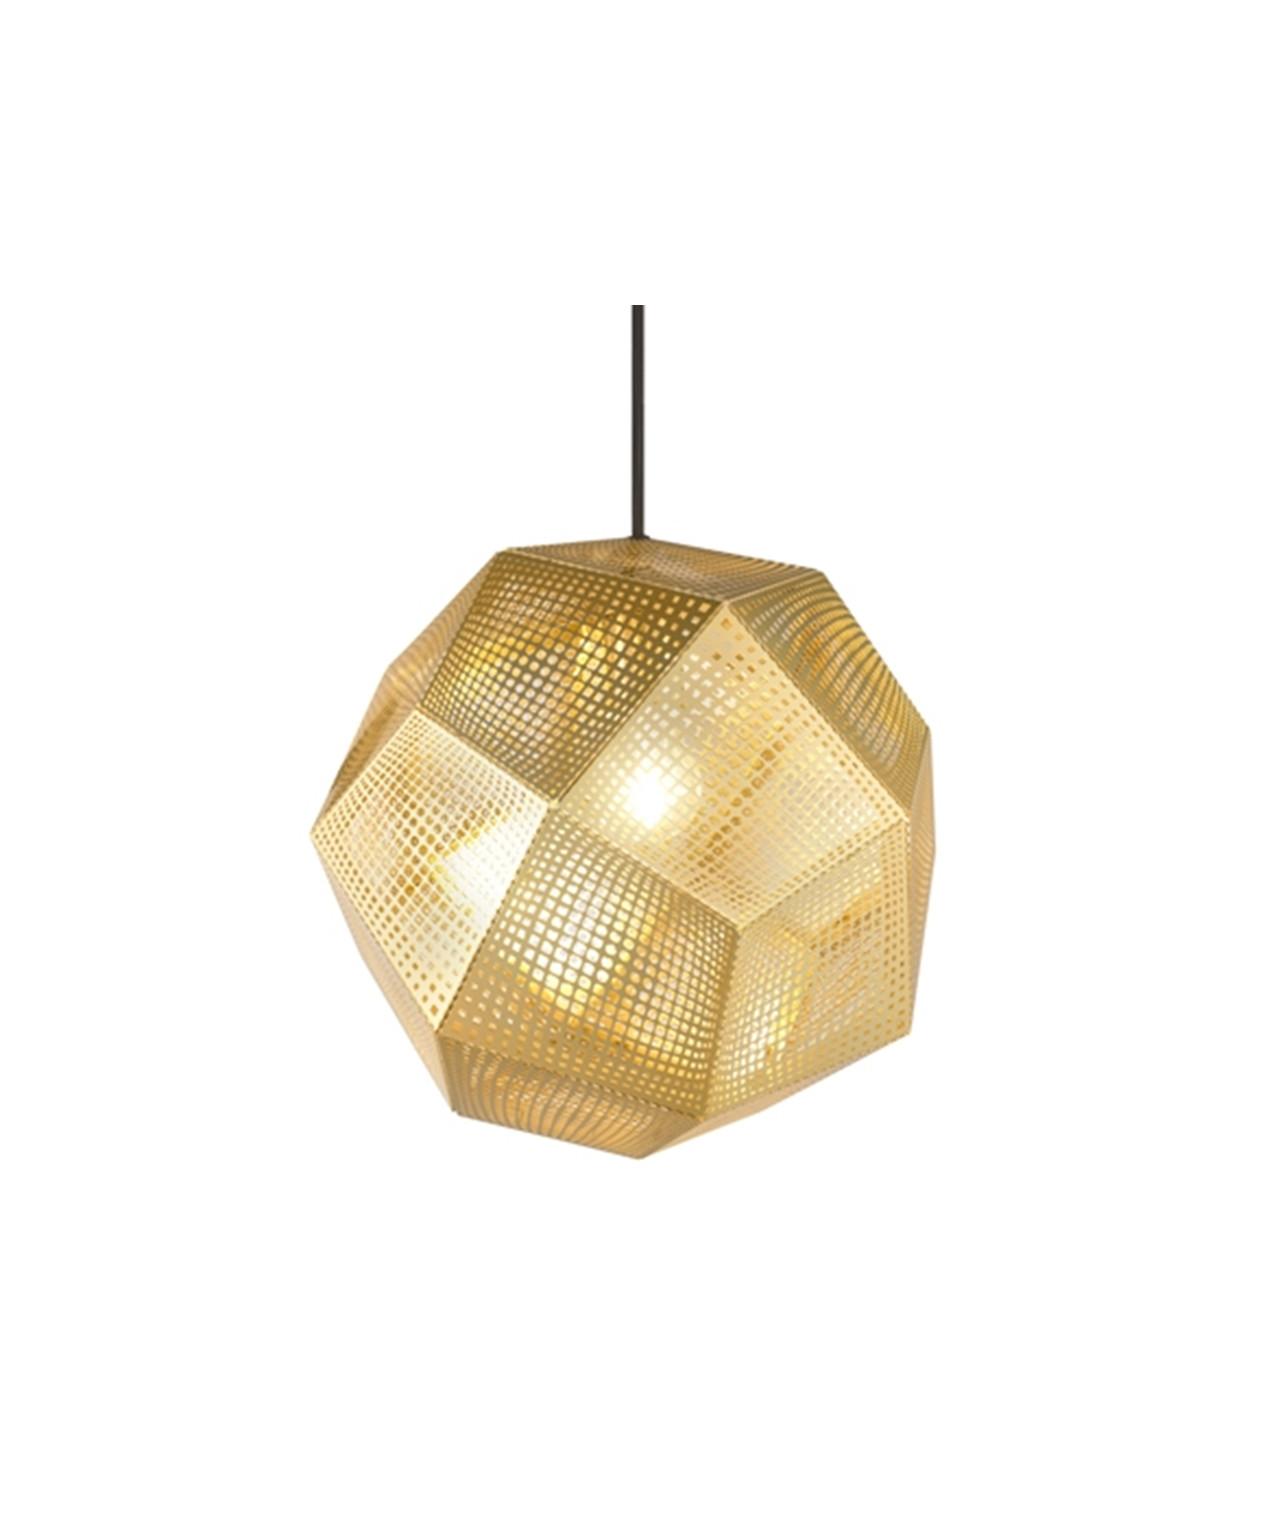 Tom Dixon Lampe Design I Beste Kvalitet Lampemesteren No